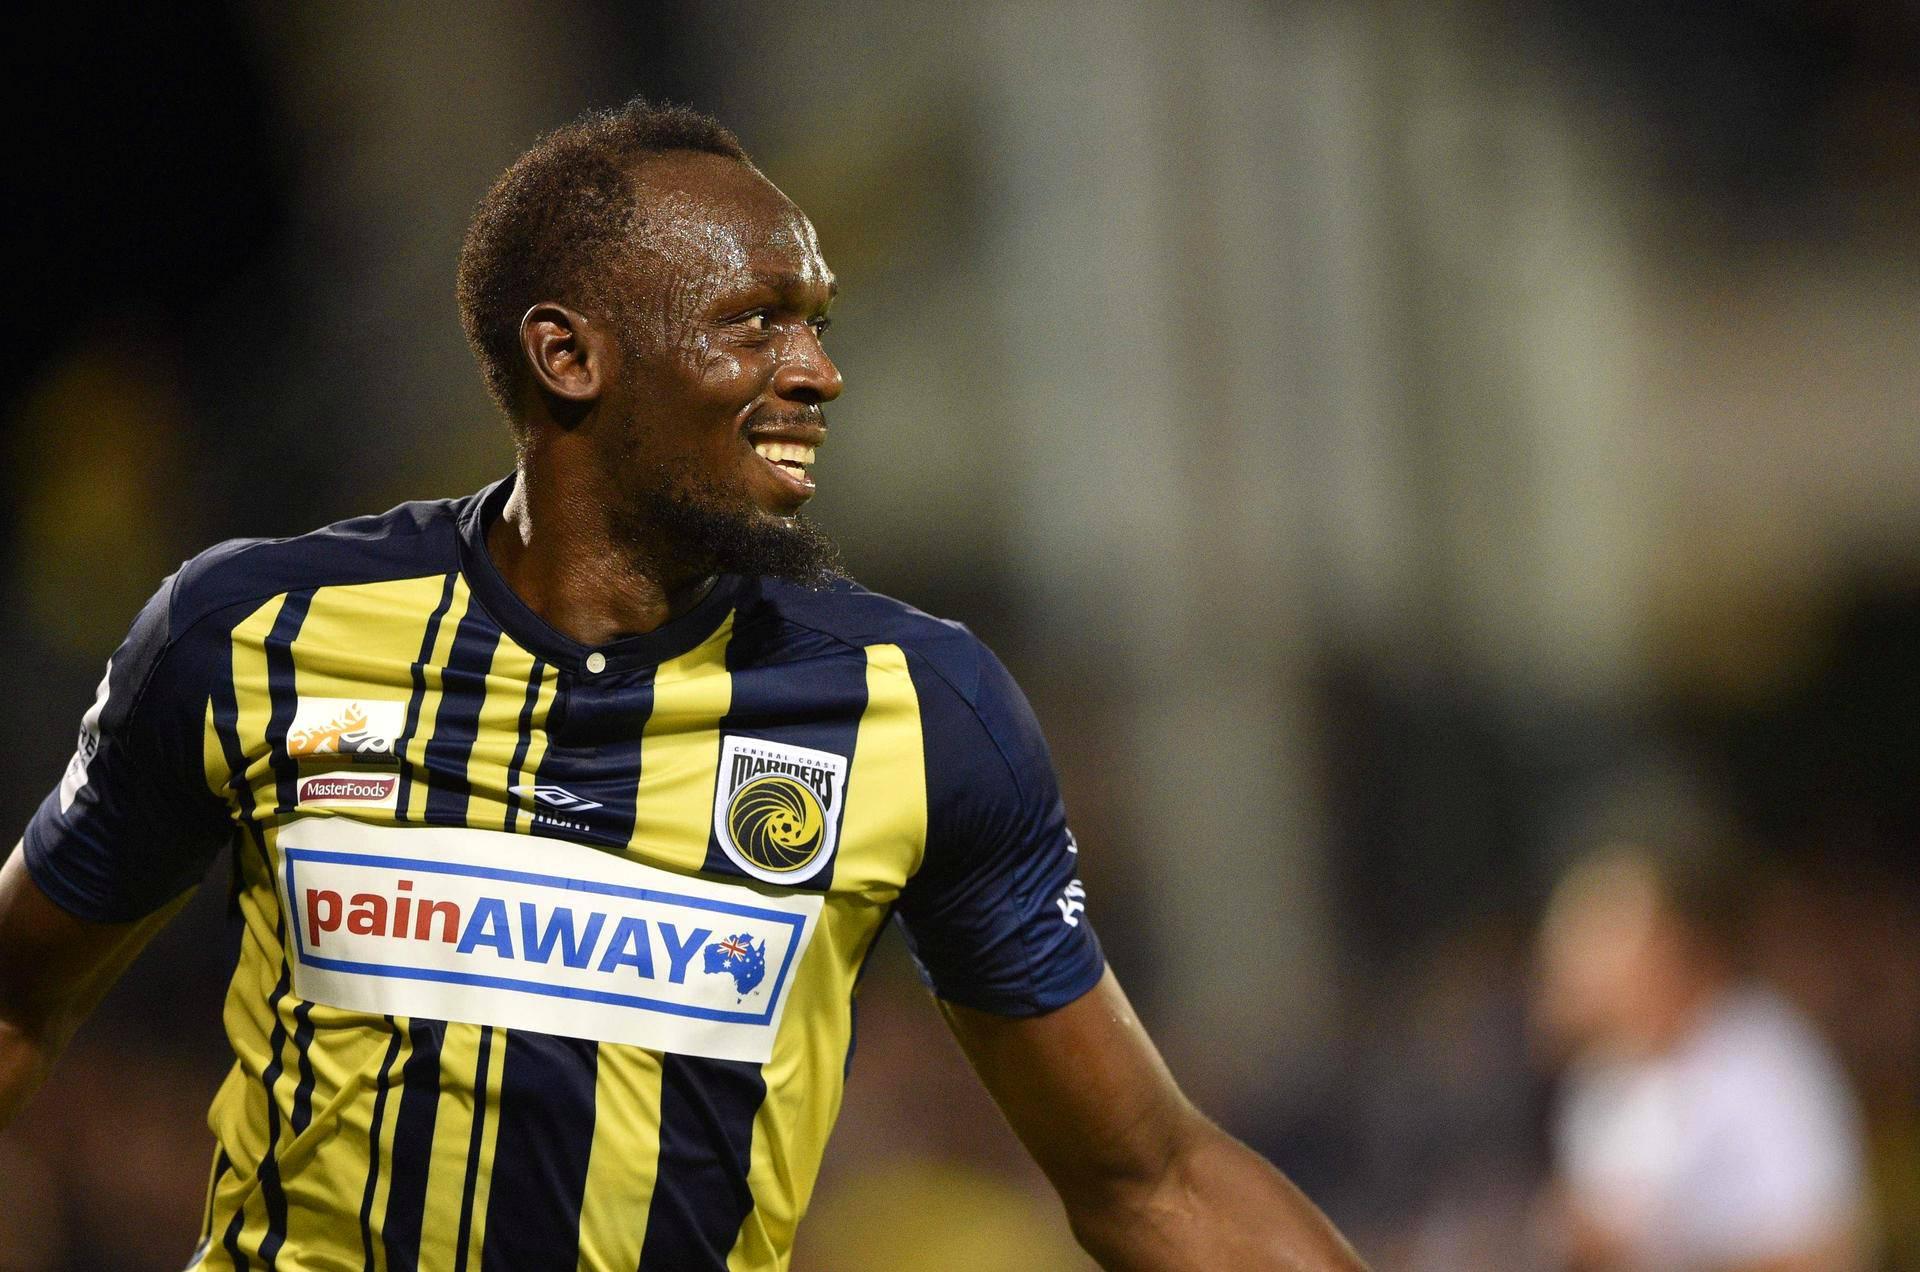 Usain Bolt Jalkapallo